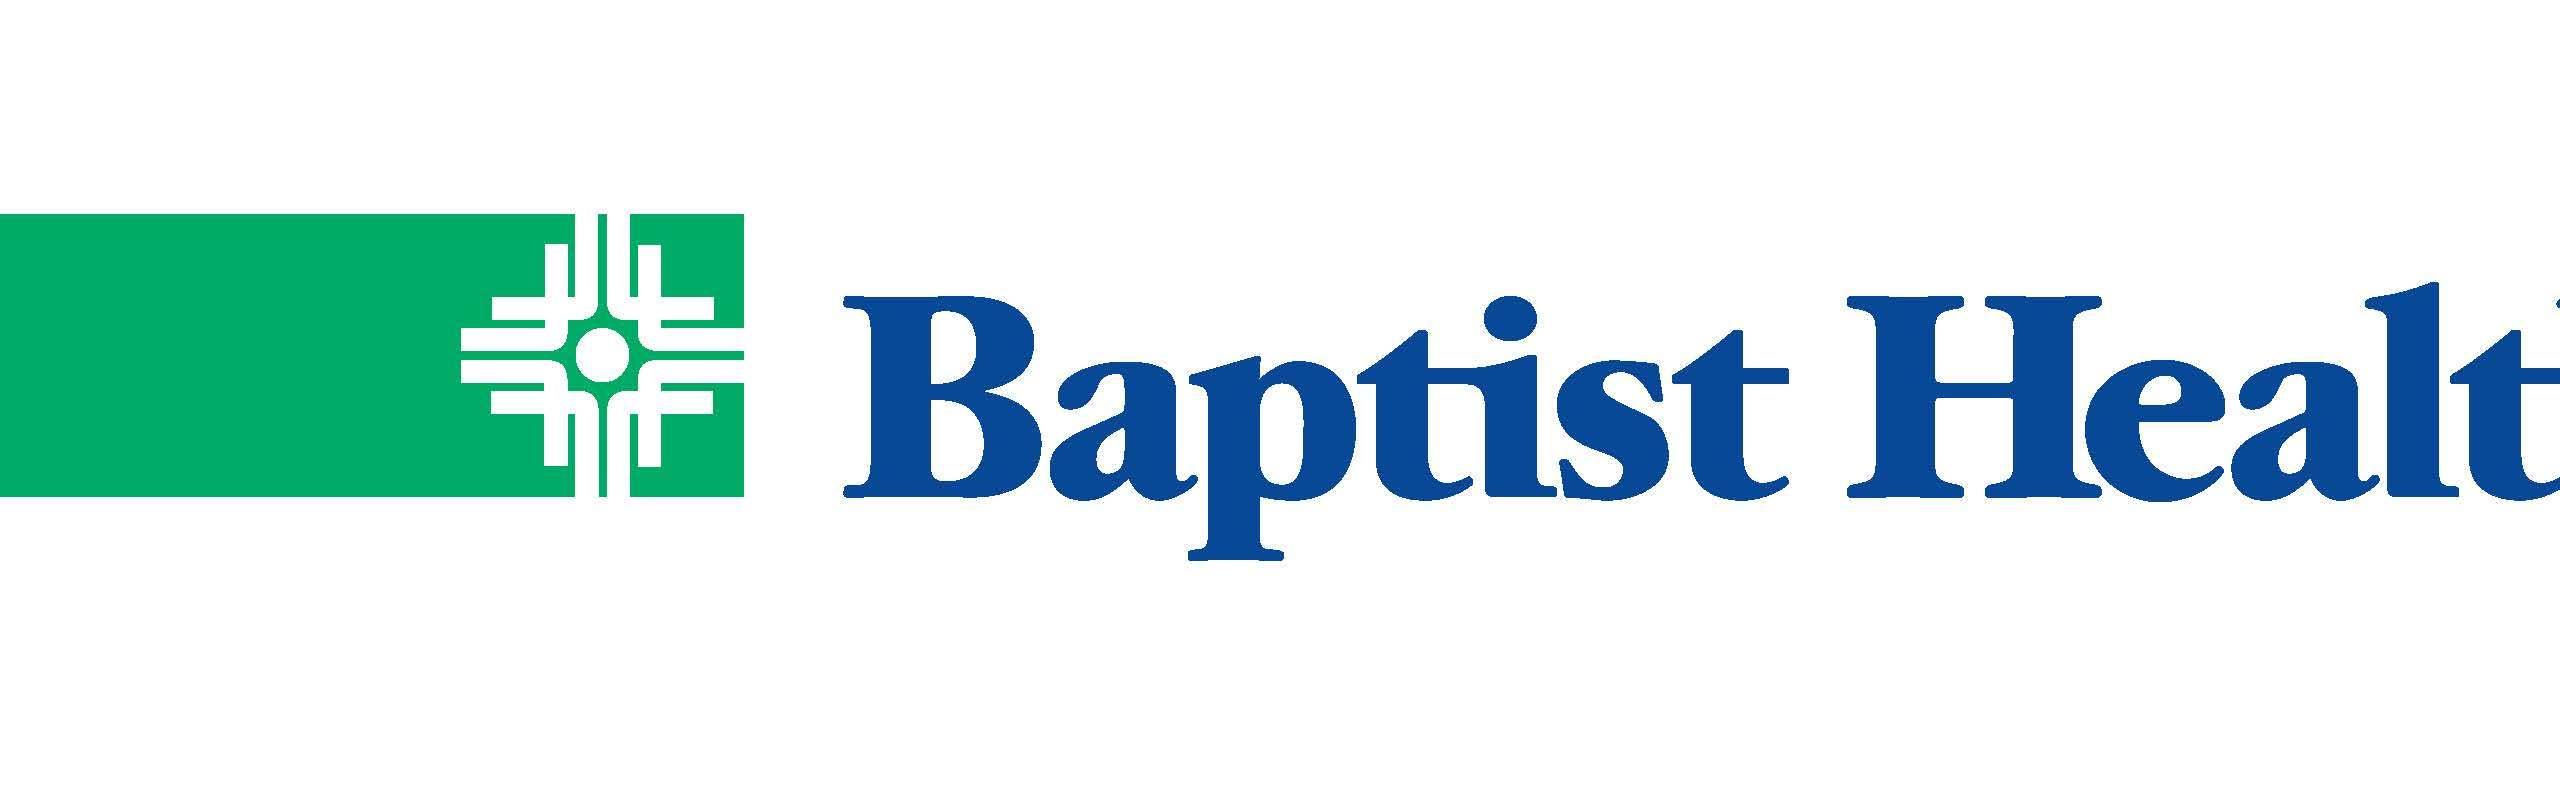 Baptist-Health-Logo_1541091970500.jpg